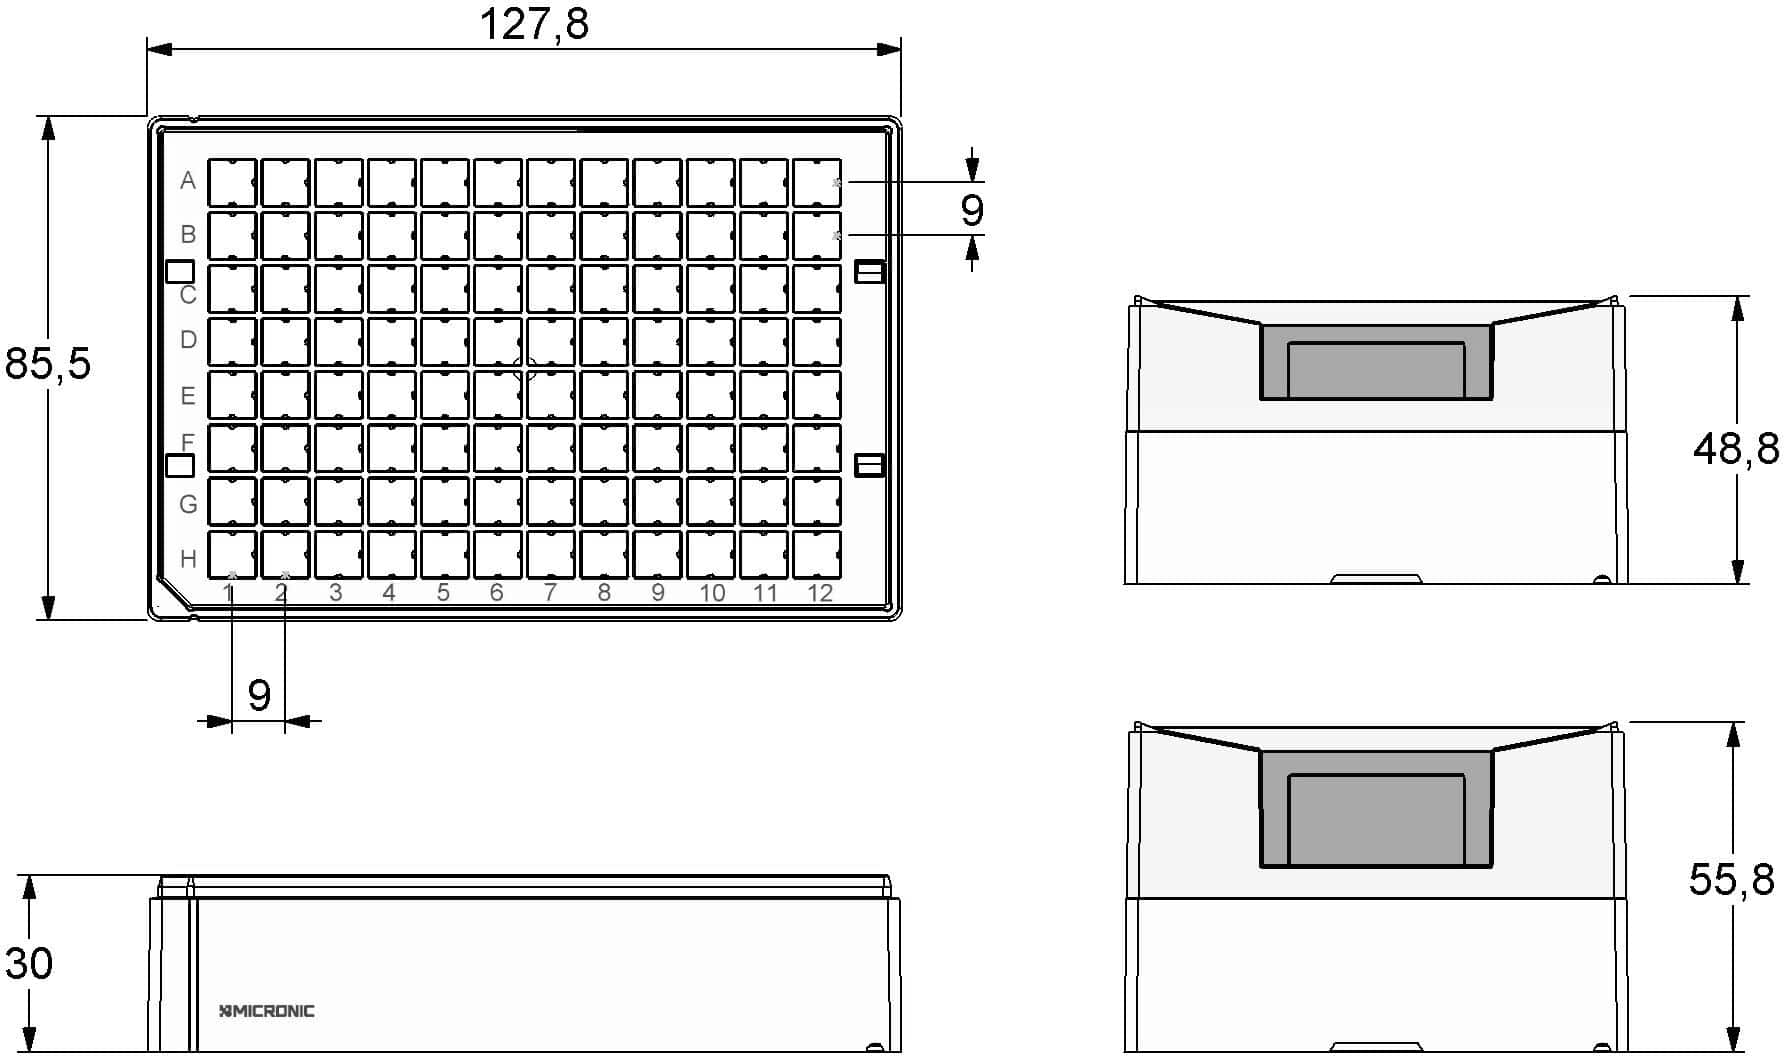 Micronic 96-4 Rack dimensions